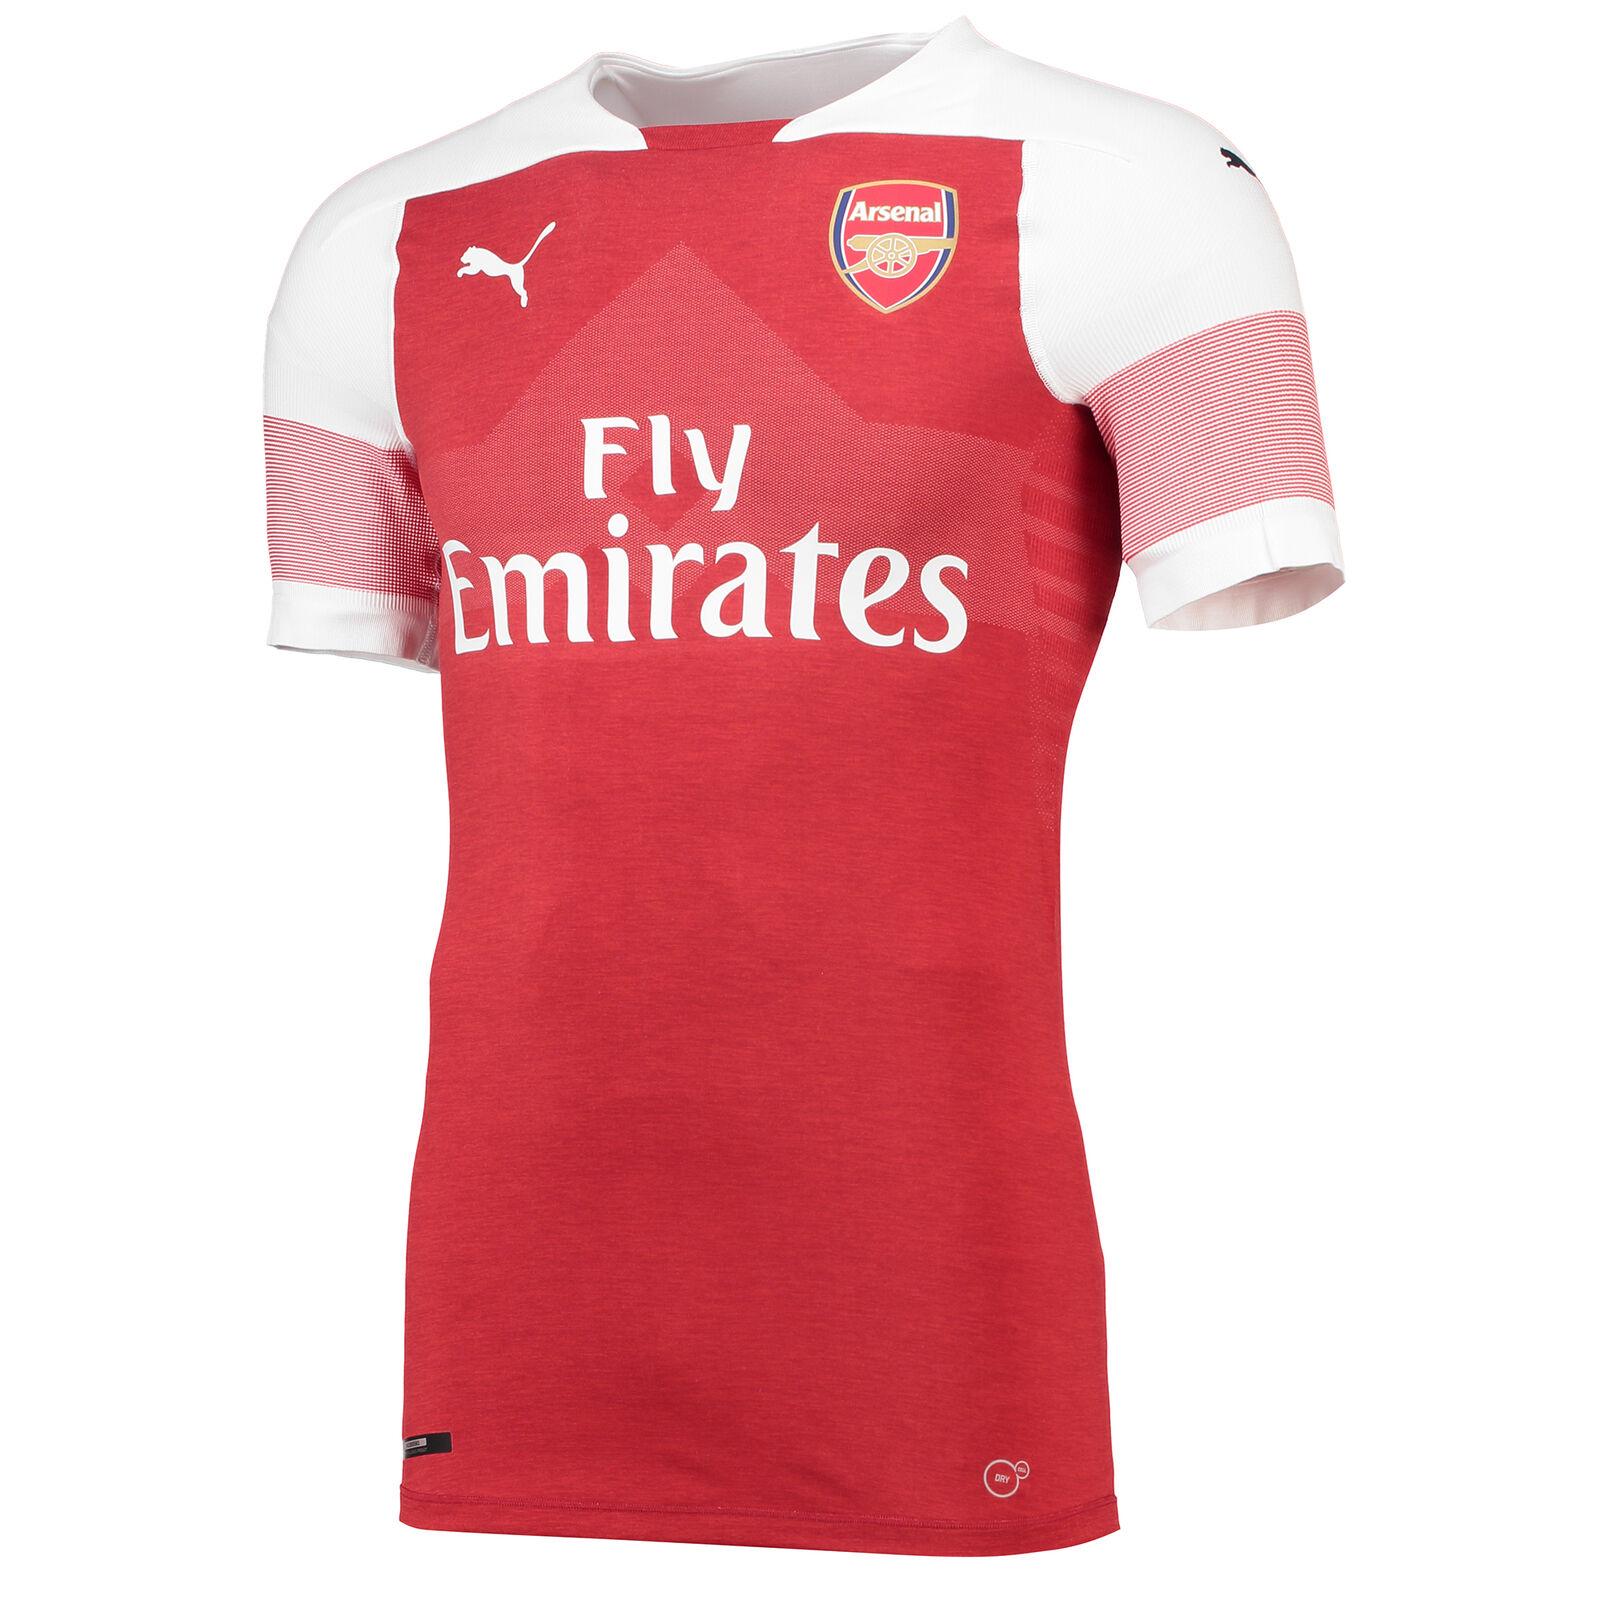 Arsenal Authentic evoKNIT Football Home Jersey Shirt Tee Top 2018 19 Mens PUMA